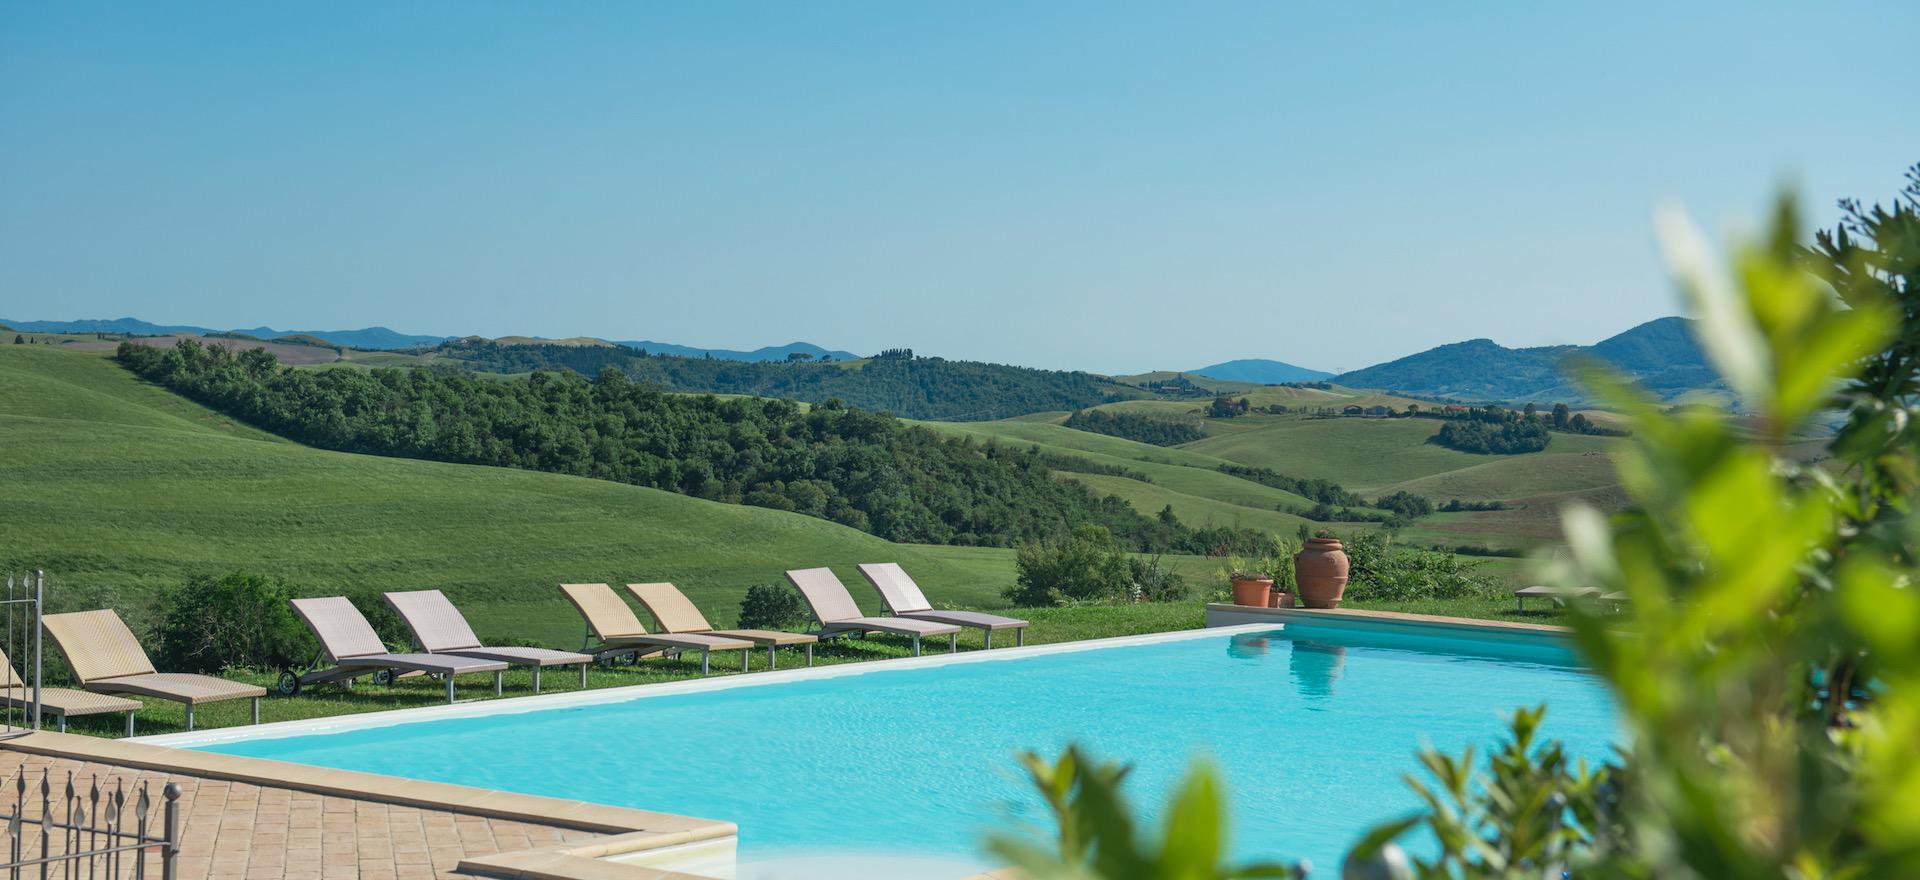 Agriturismo Tuscany Fun agriturismo in Tuscany with panoramic swimming pool